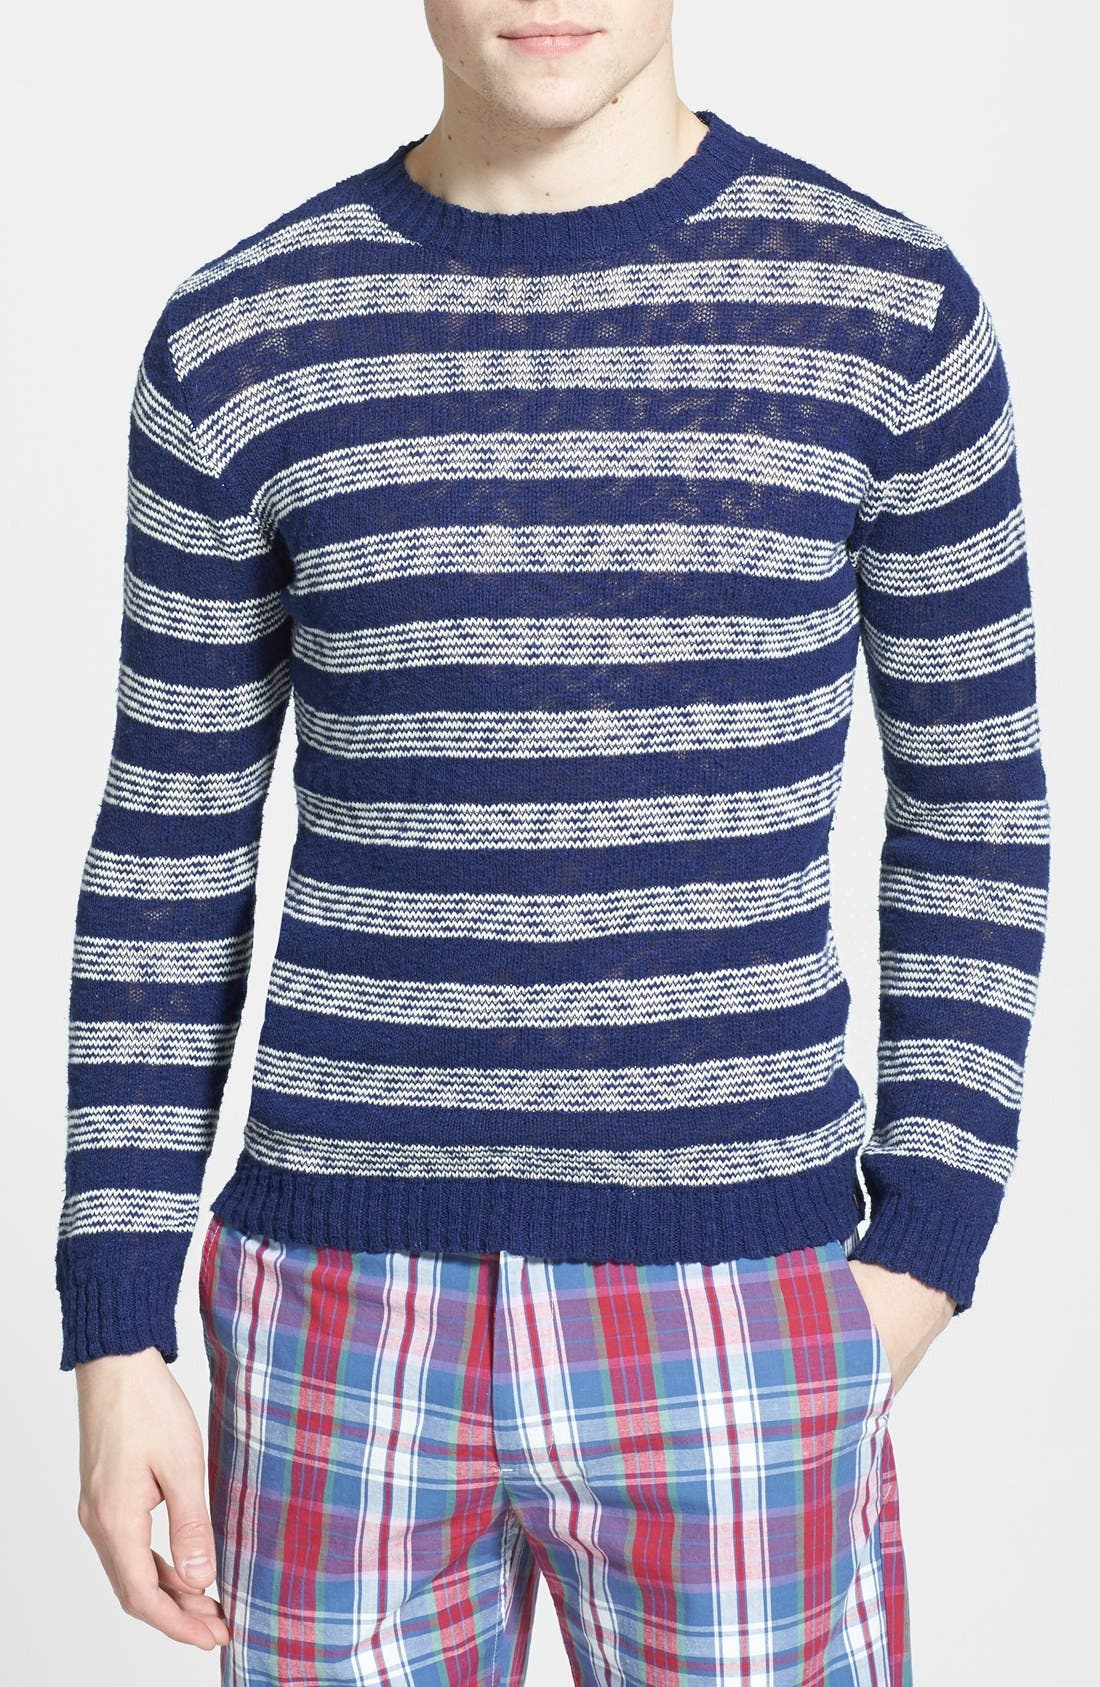 Main Image - Gant Rugger 'The Slubber' Sweater